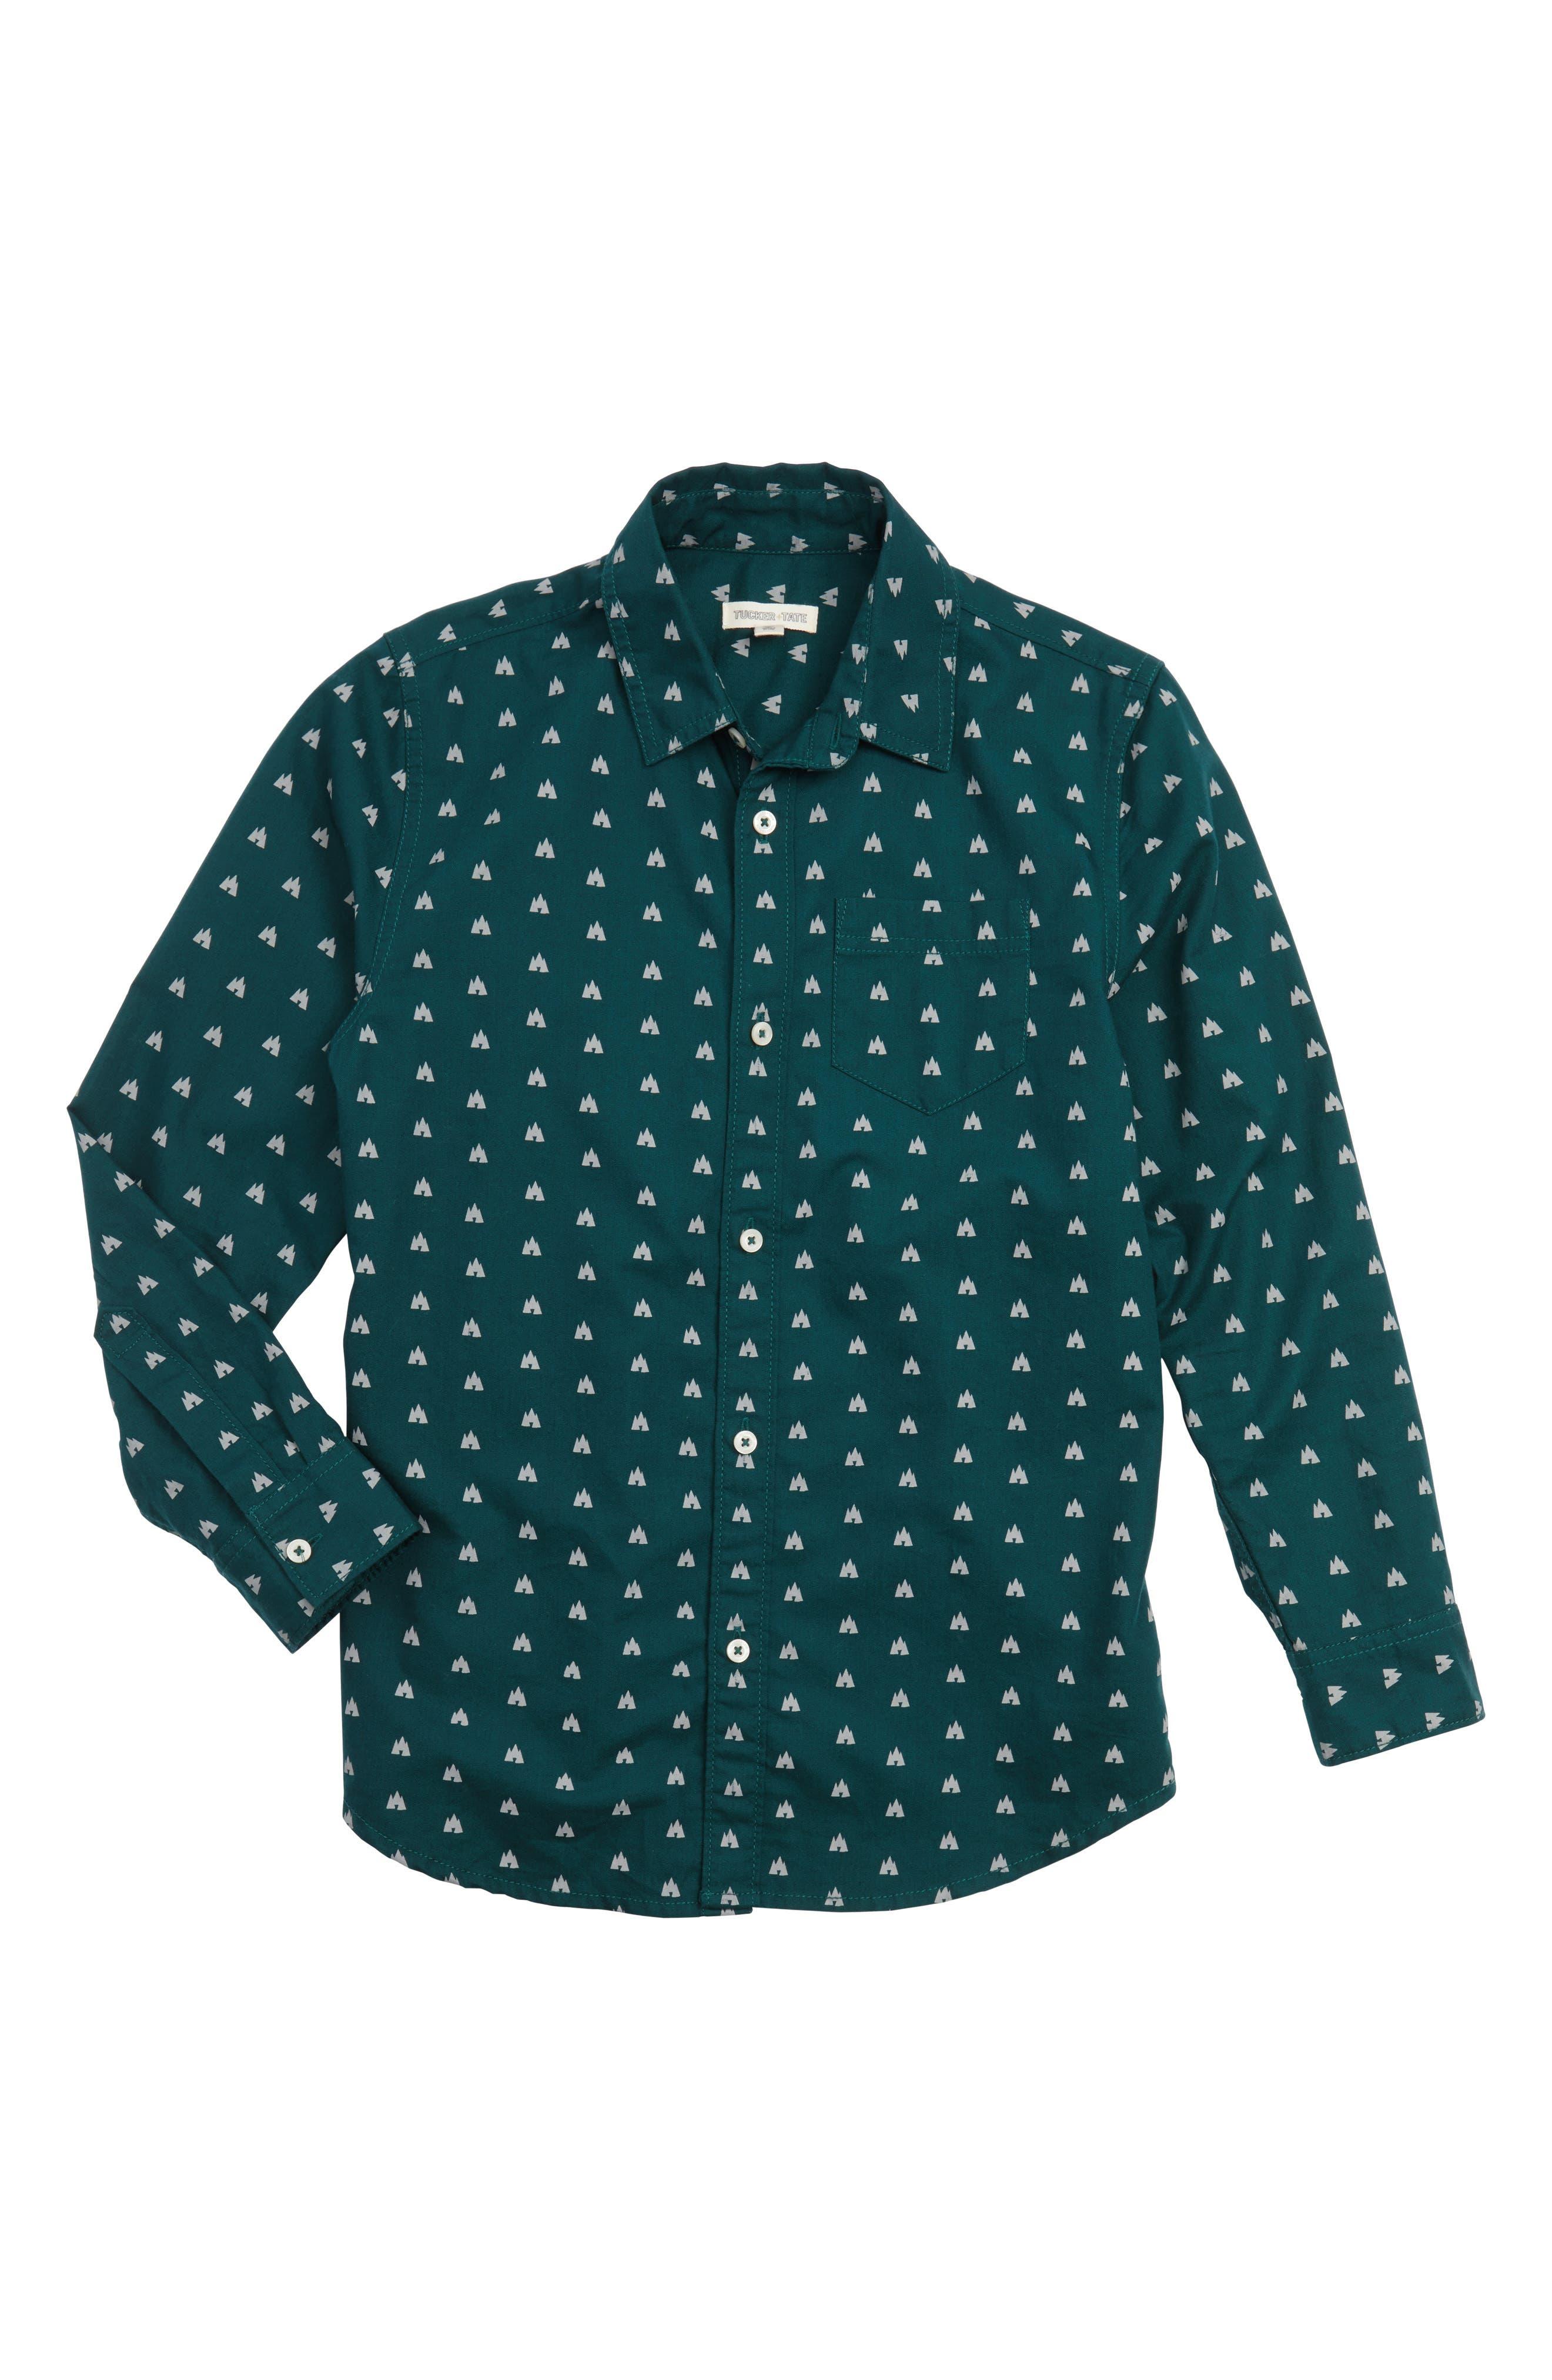 Pine Tree Sport Shirt,                         Main,                         color, 301